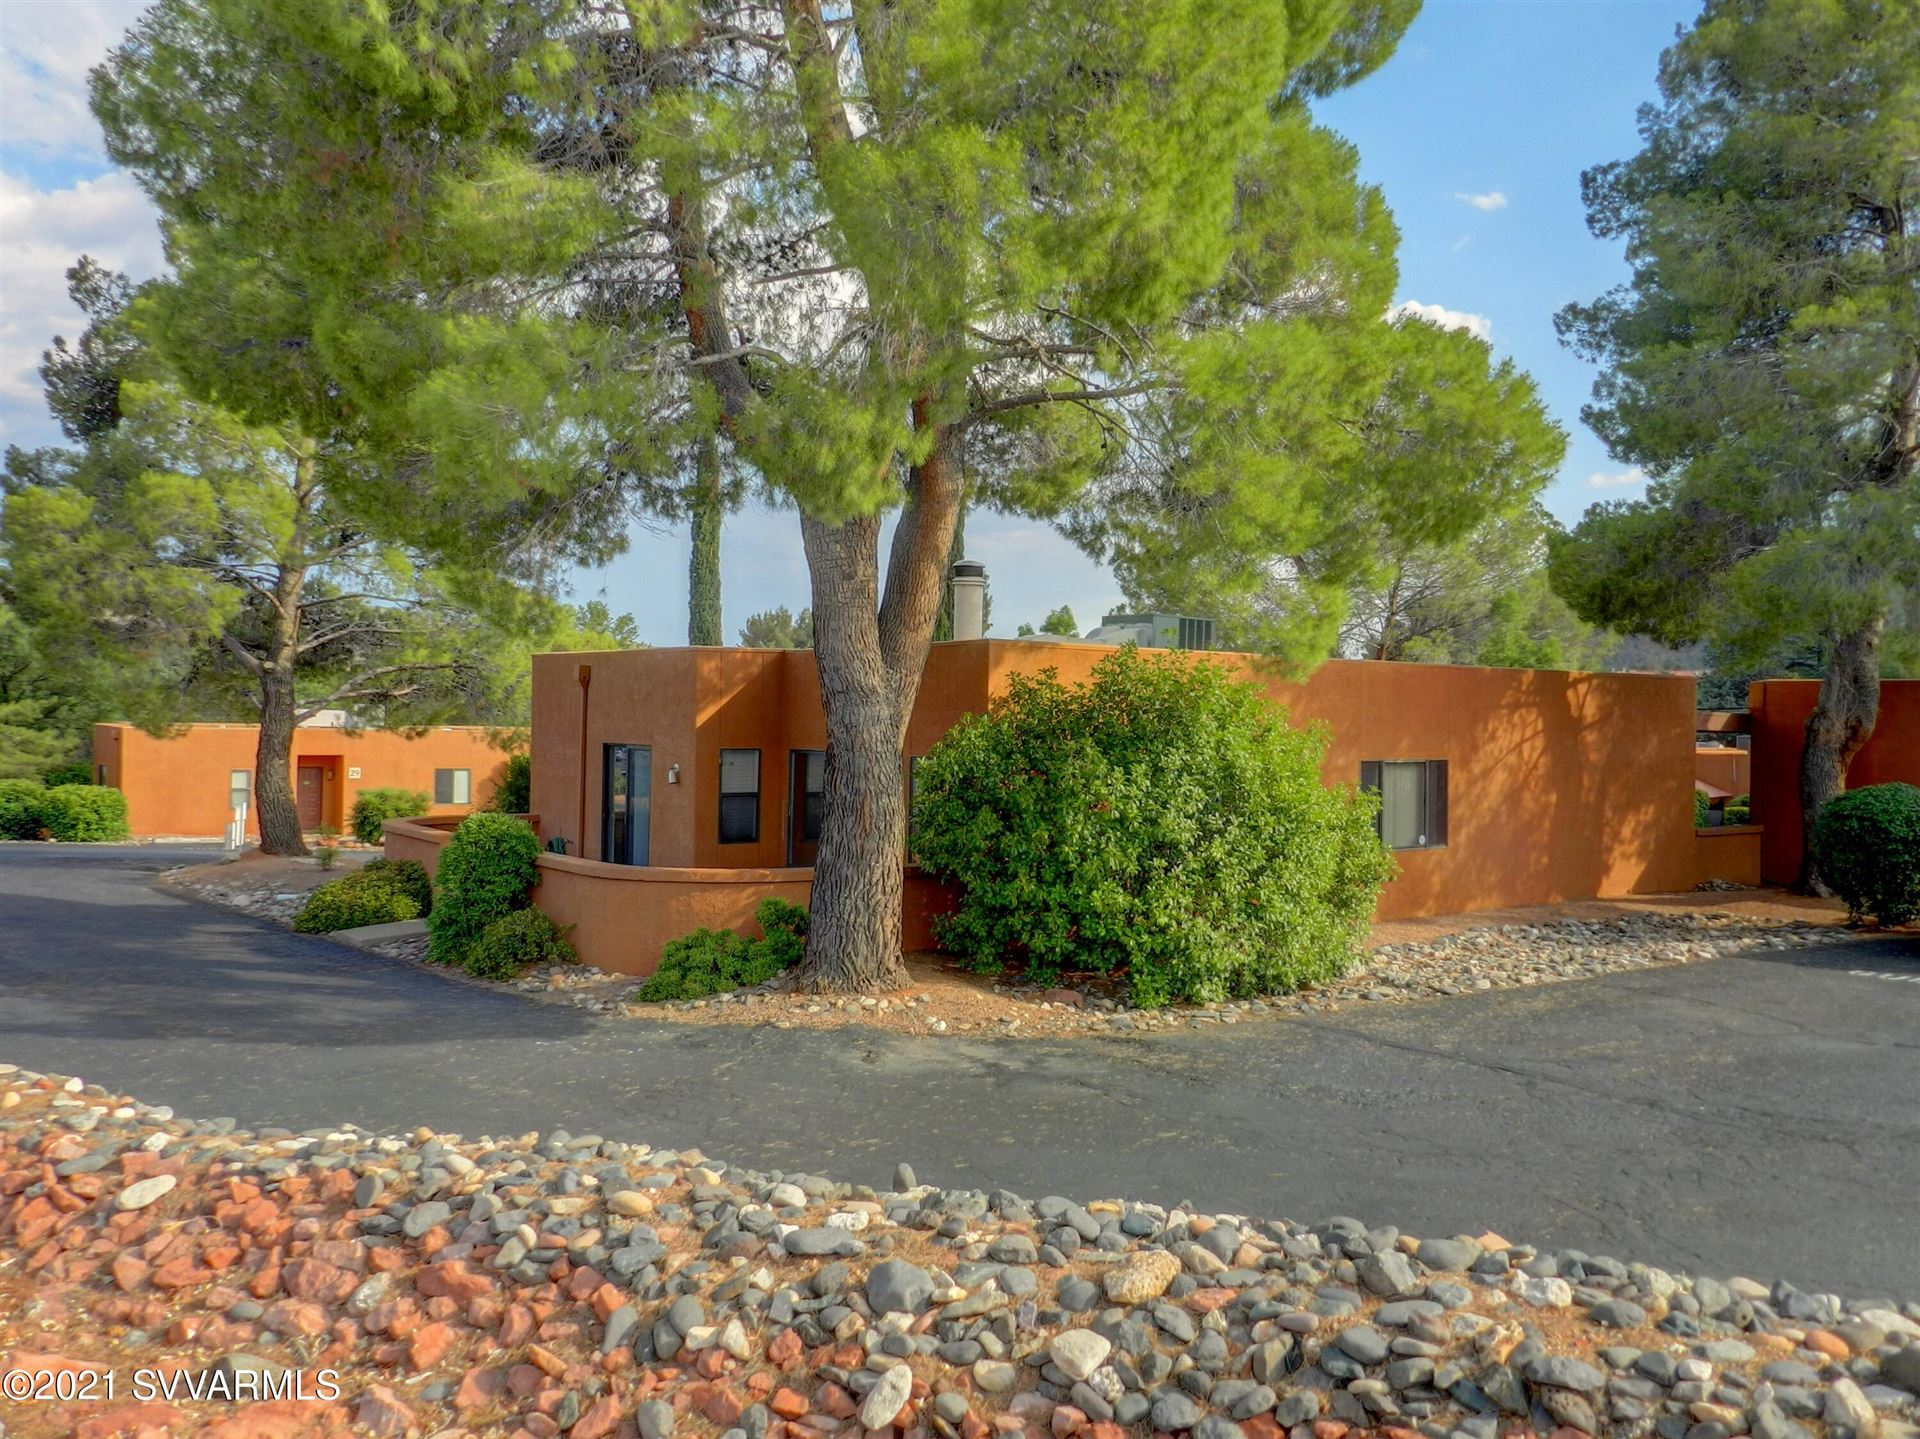 Photo of 165 Verde Valley School Rd #26, Sedona, AZ 86351 (MLS # 527187)